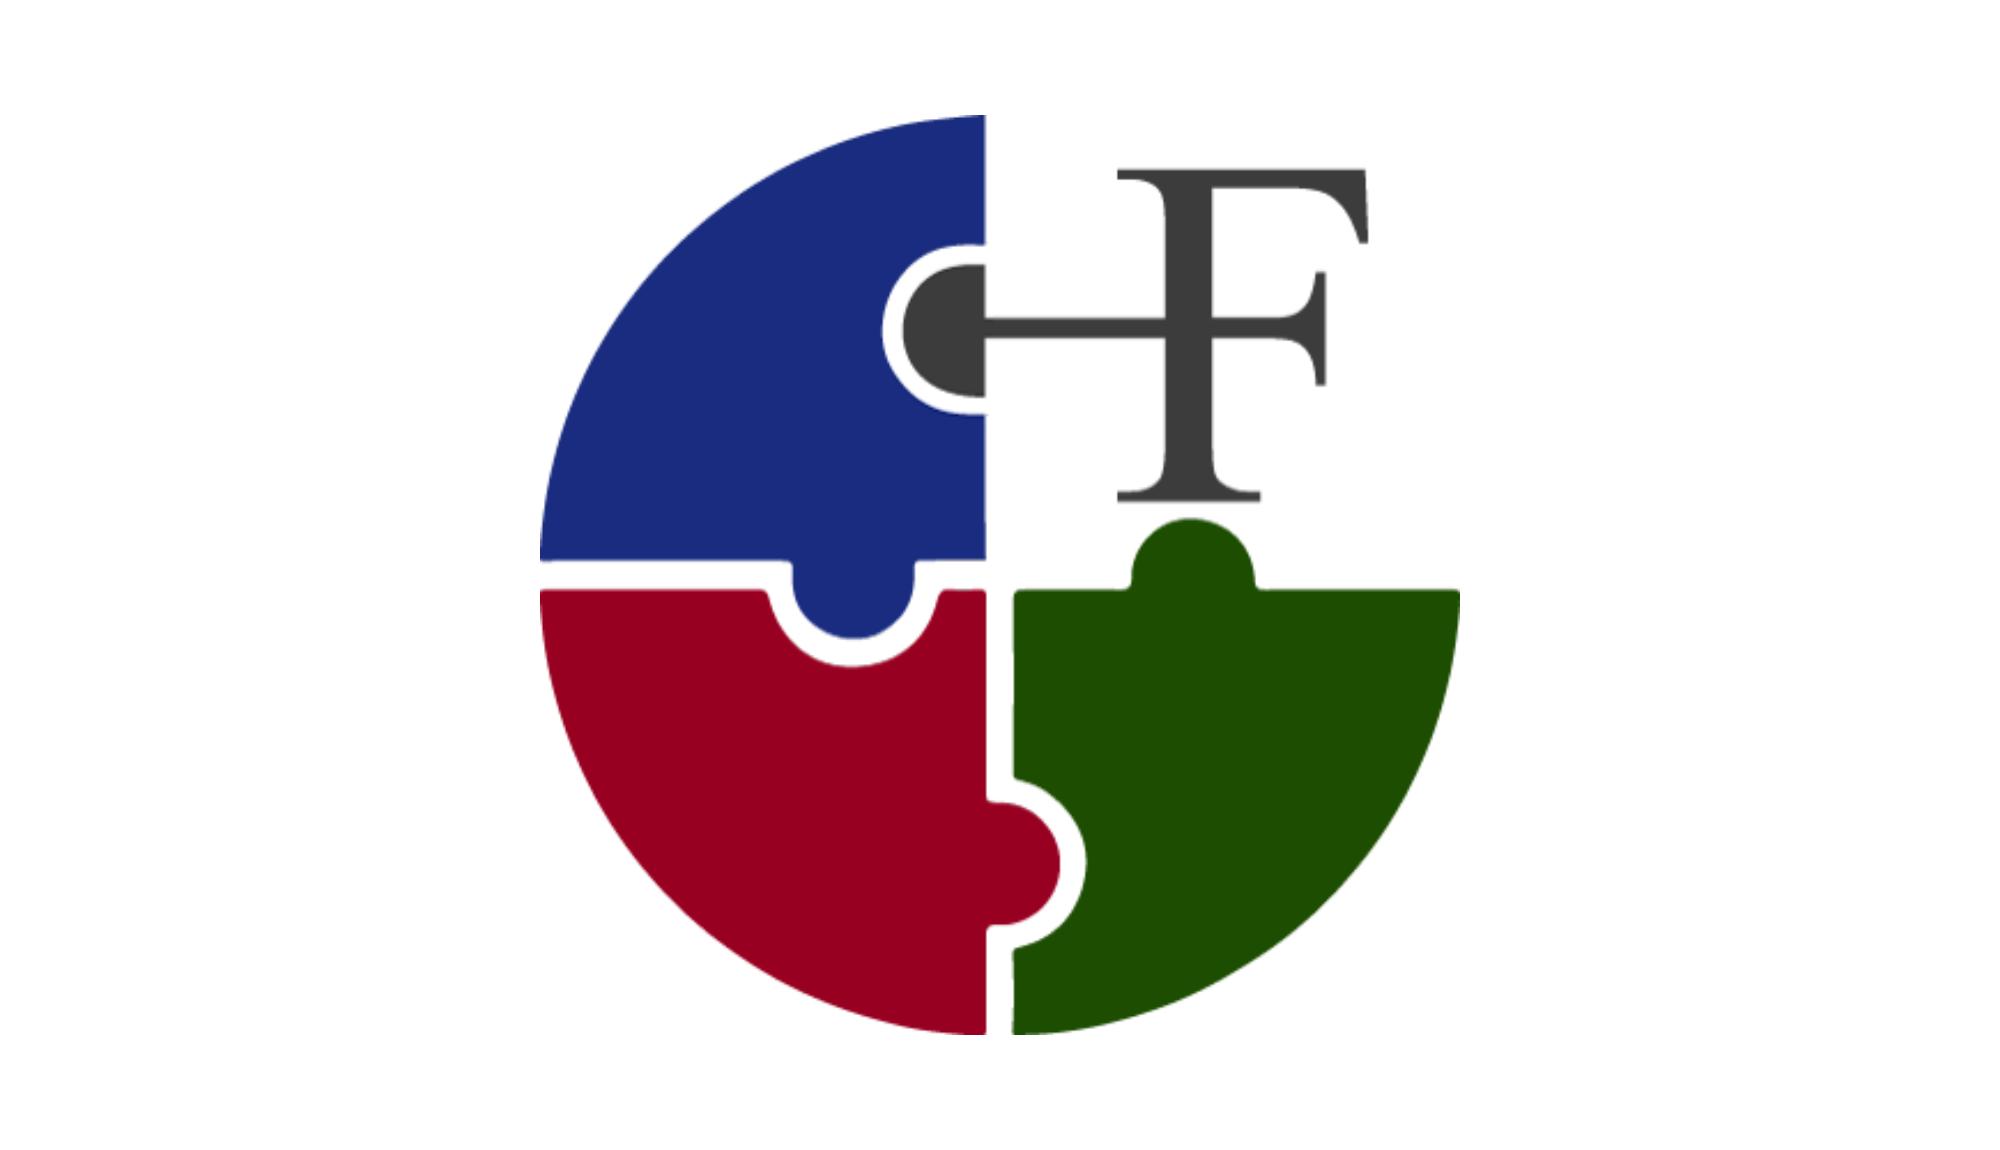 FiBrick Financial Services